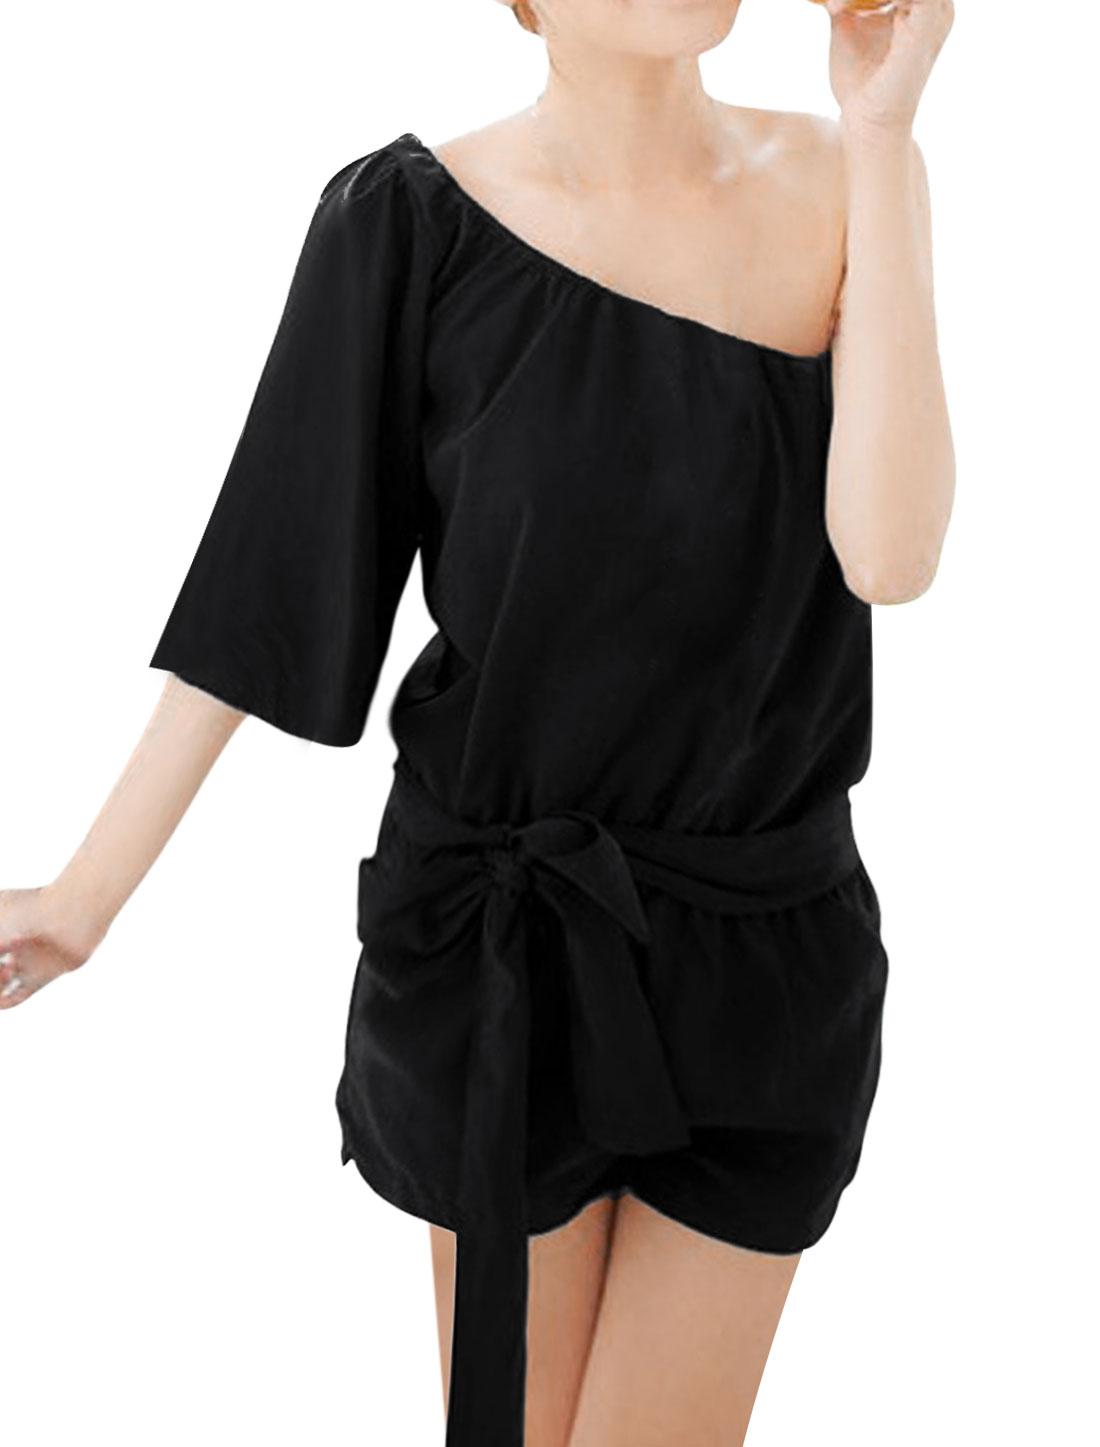 Women Black One Shoulder 3/4 Sleeve Romper Short Jumpsuit XS